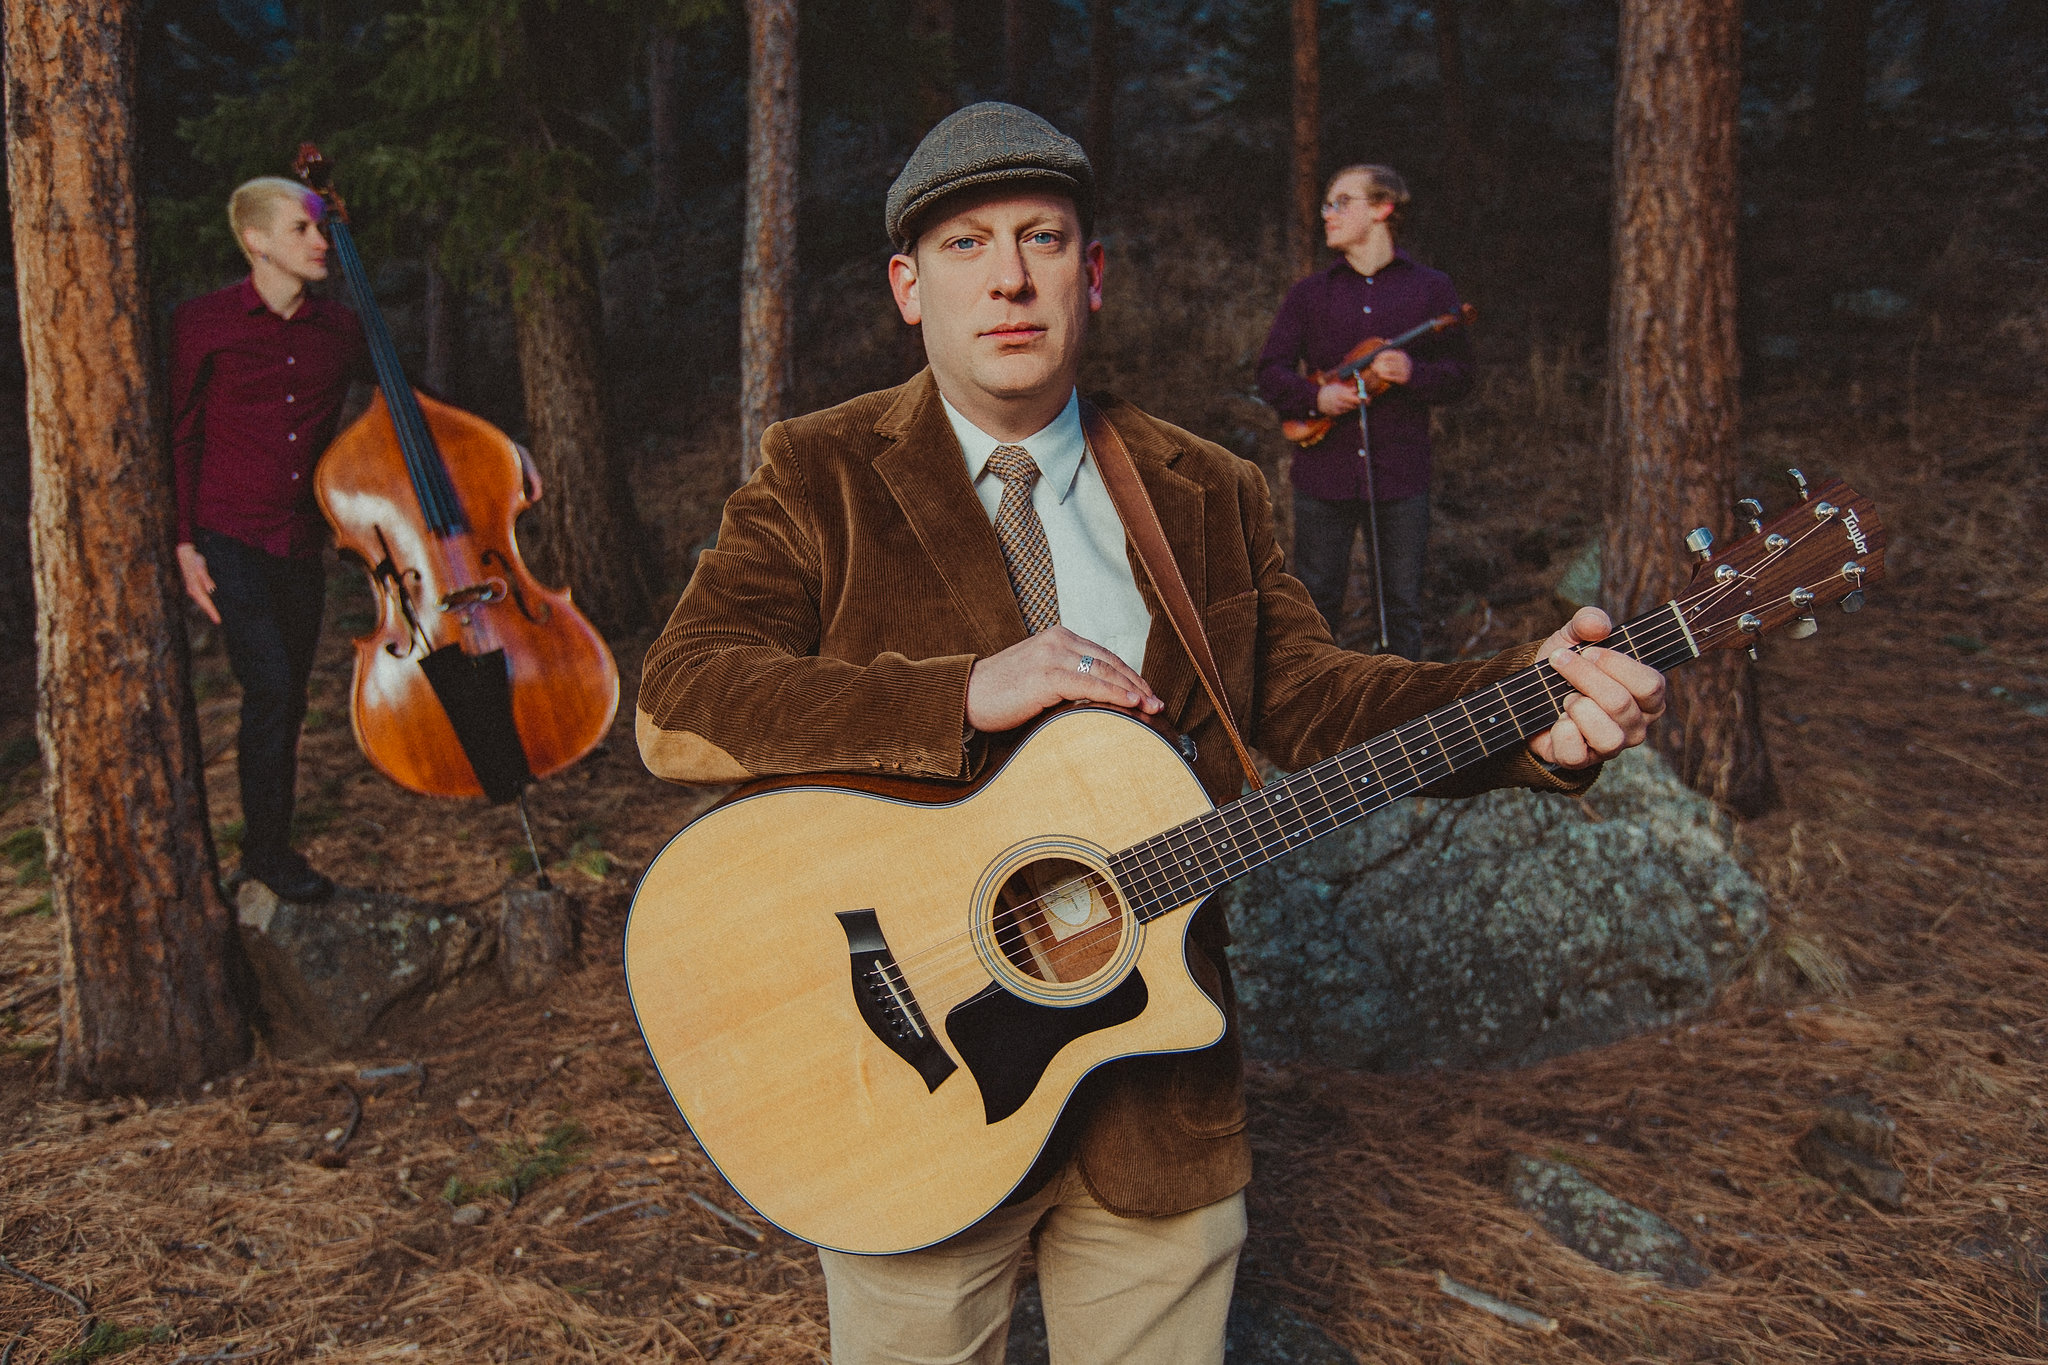 Avourneen to release first full-length album at Clocktower Cabaret